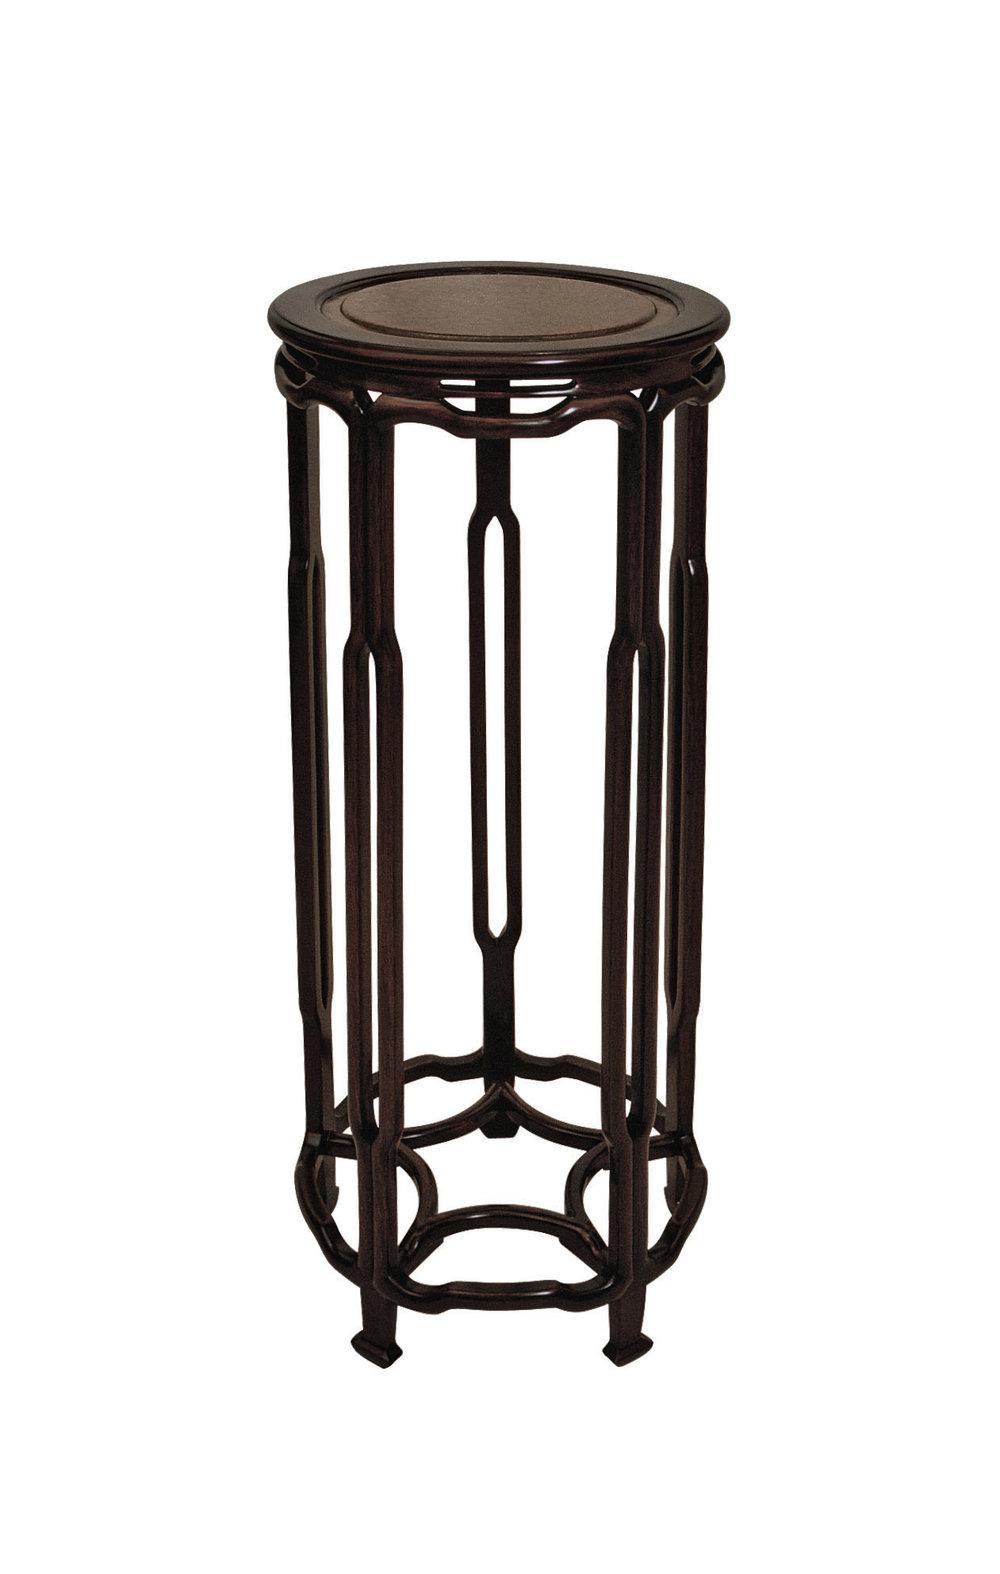 ....chinese qing style furniture : stand ..中式清式家具 : 花几....